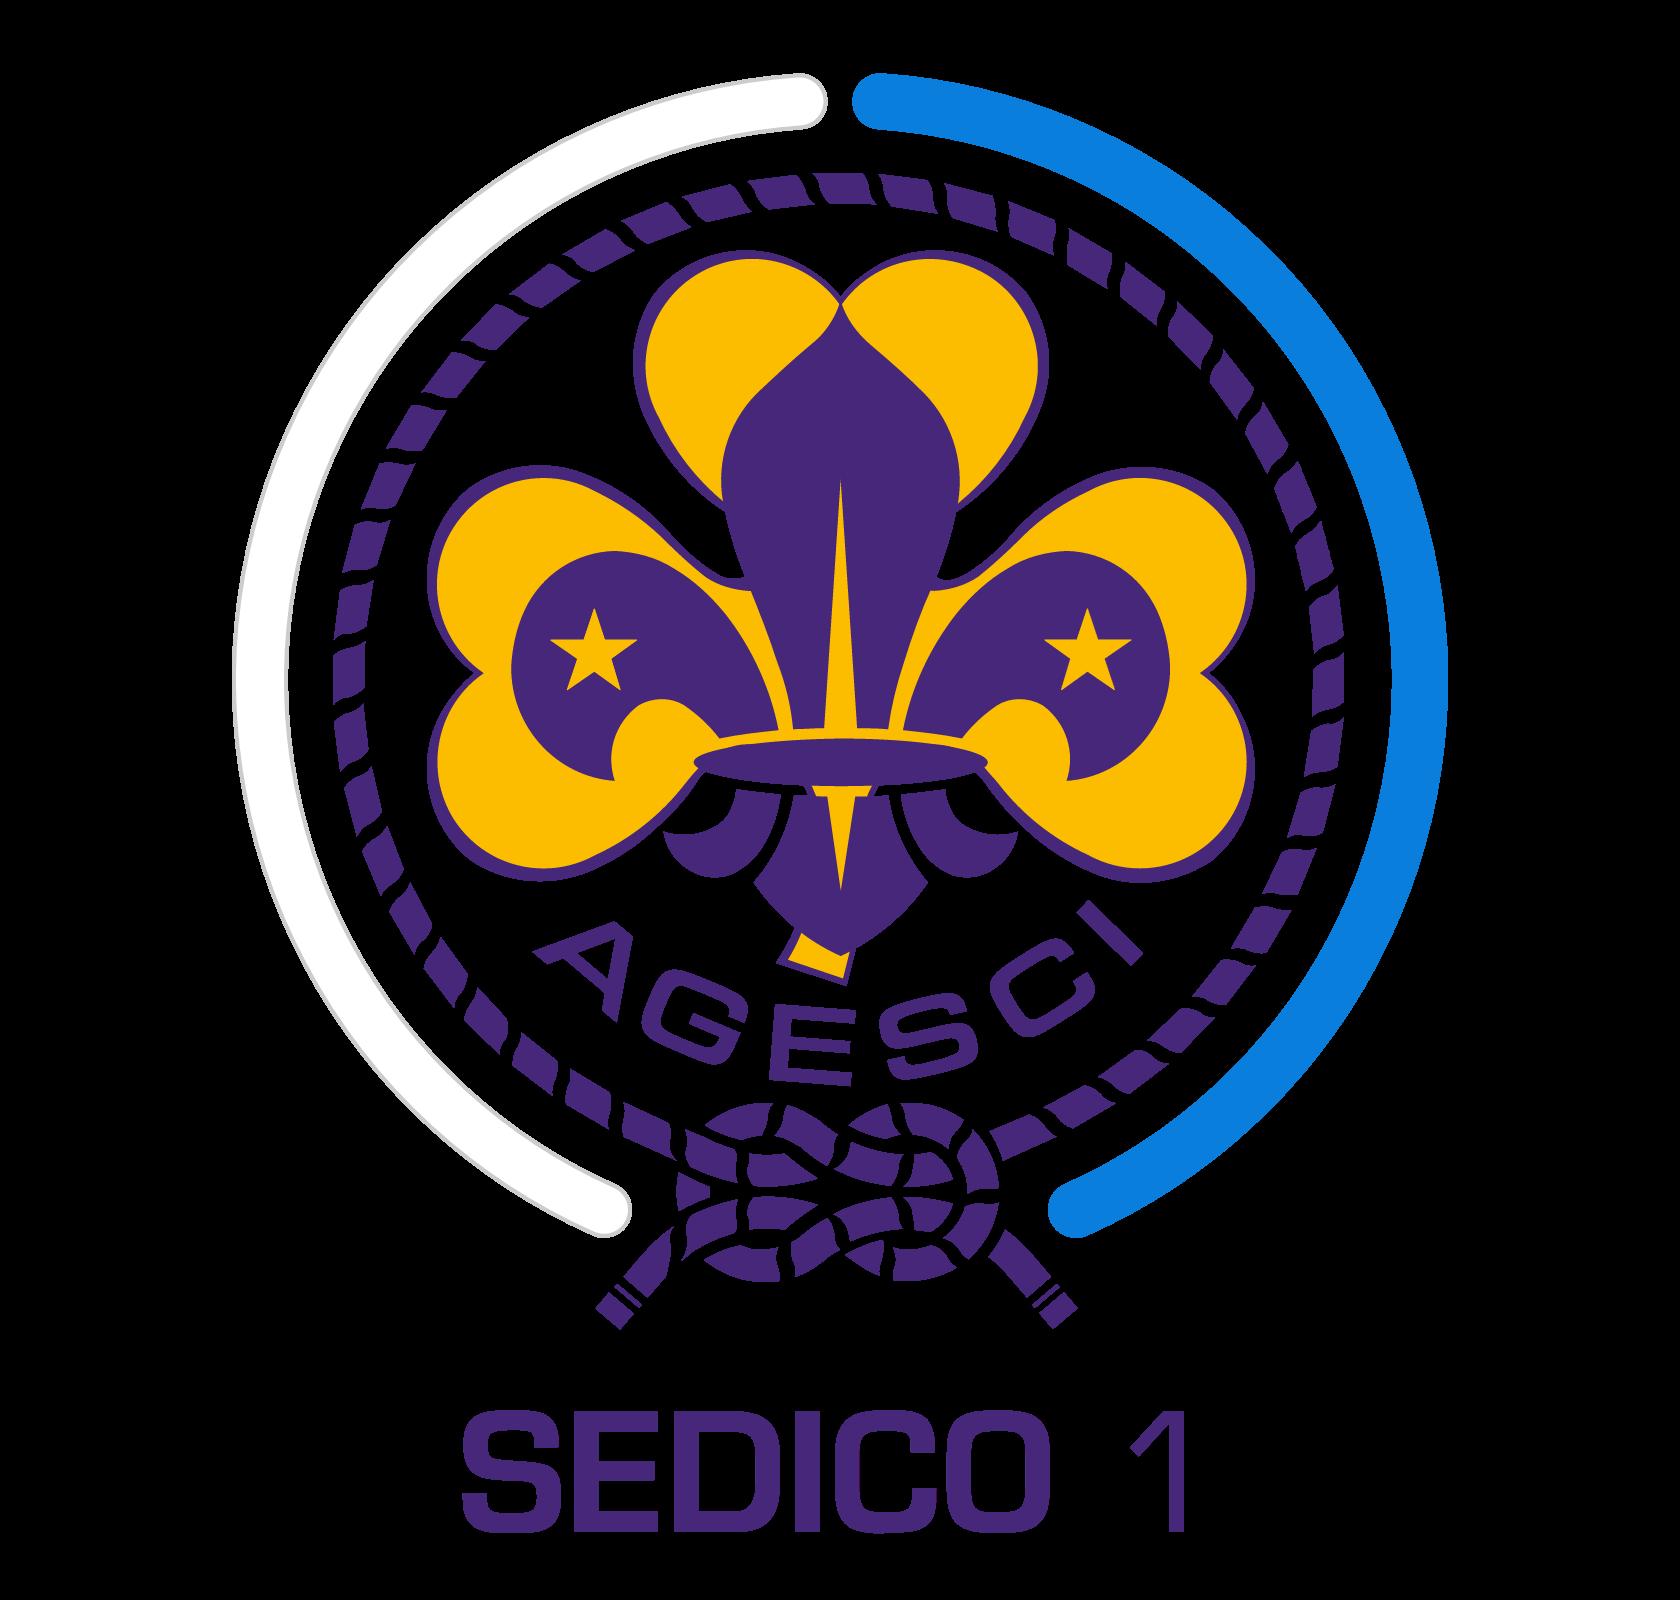 <h6><center>&clubs; Gruppo Scout Sedico 1 &clubs;</center></h6>